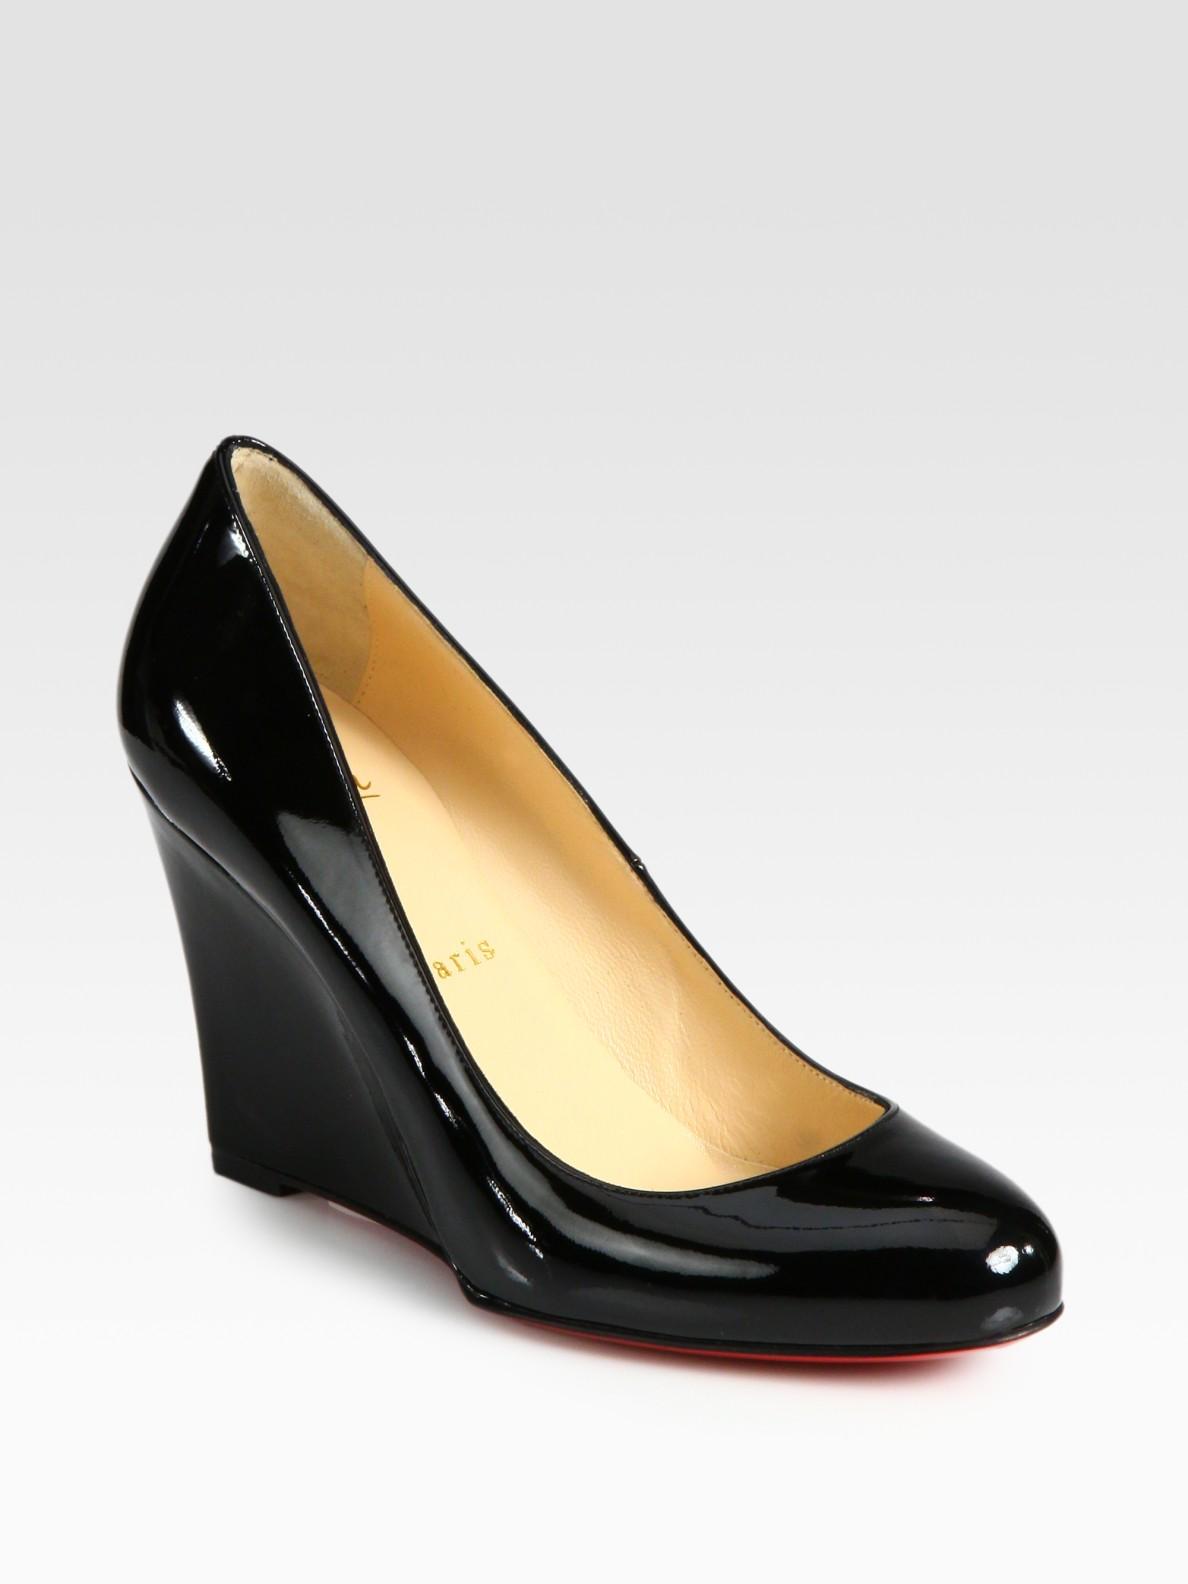 Black Patent Court Shoe Uk